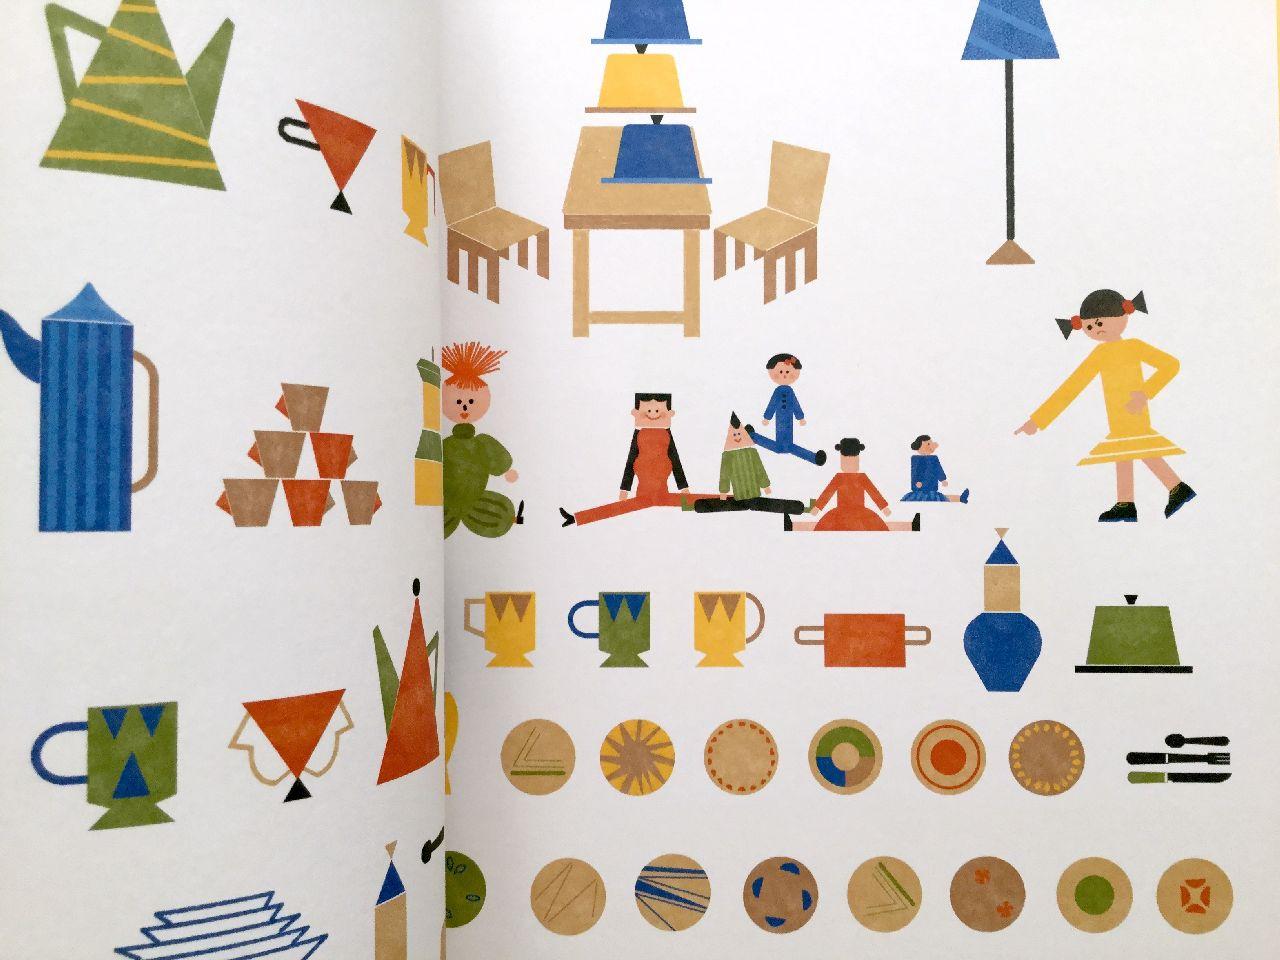 Gaia Stella, Bambini e bambole, Einaudi